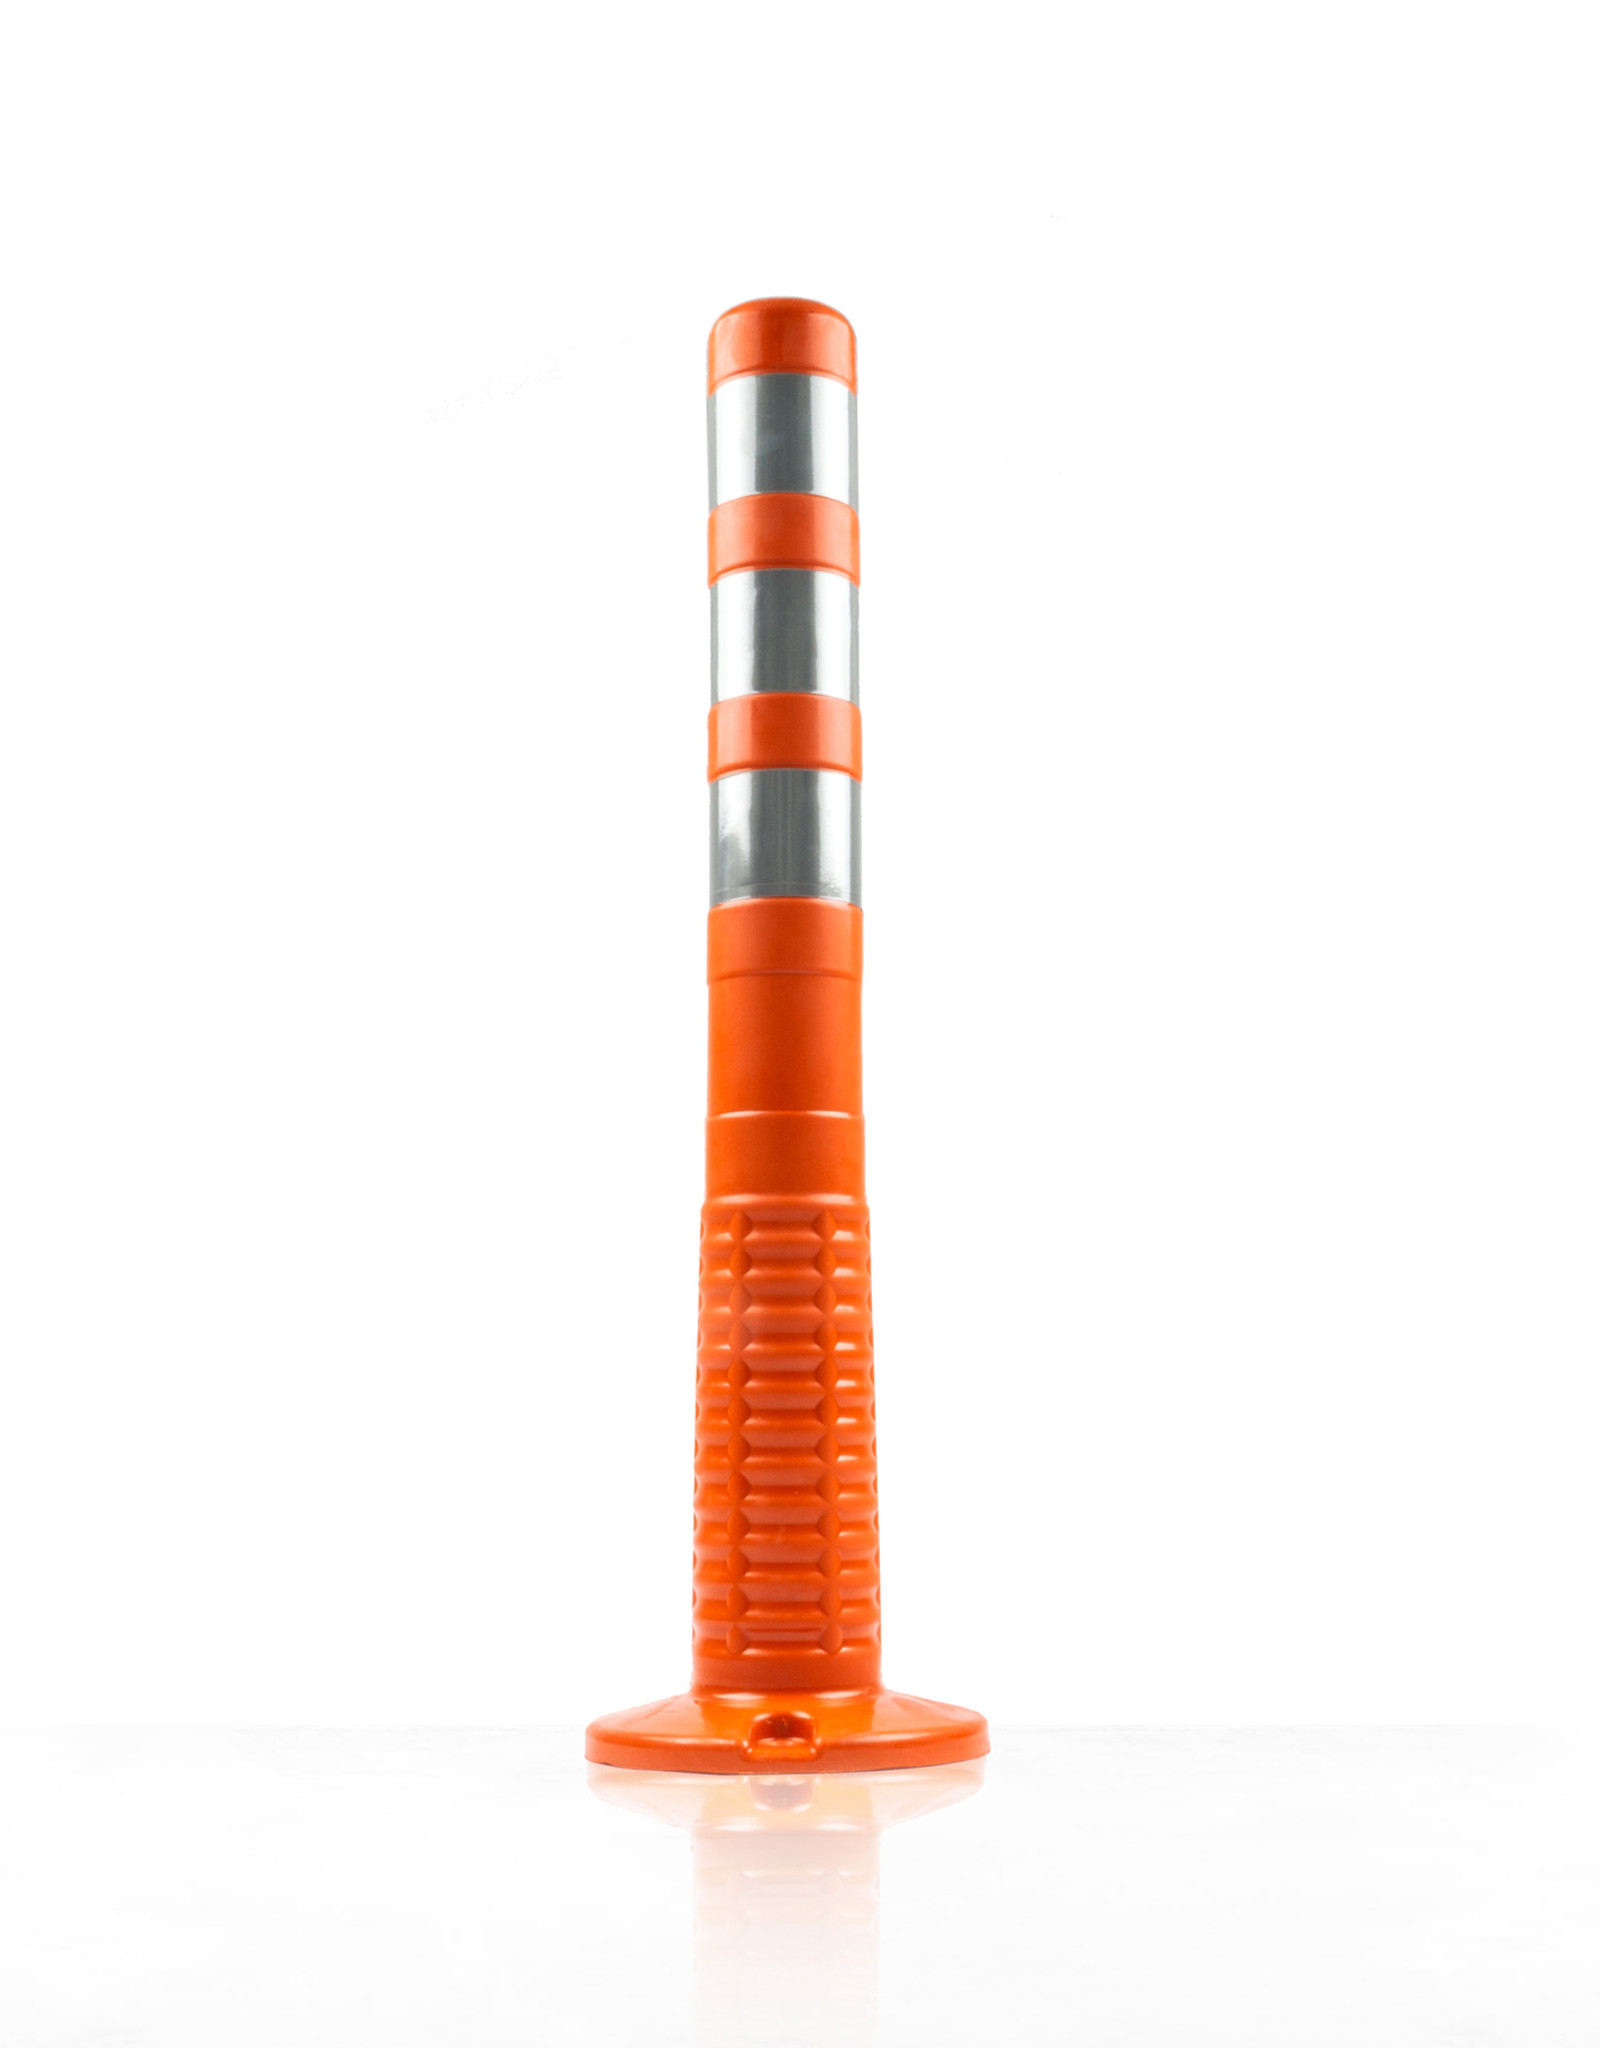 Ri-Traffic   Flexibele afzetpaal oranje, T-FLEX 75 cm plooibaken